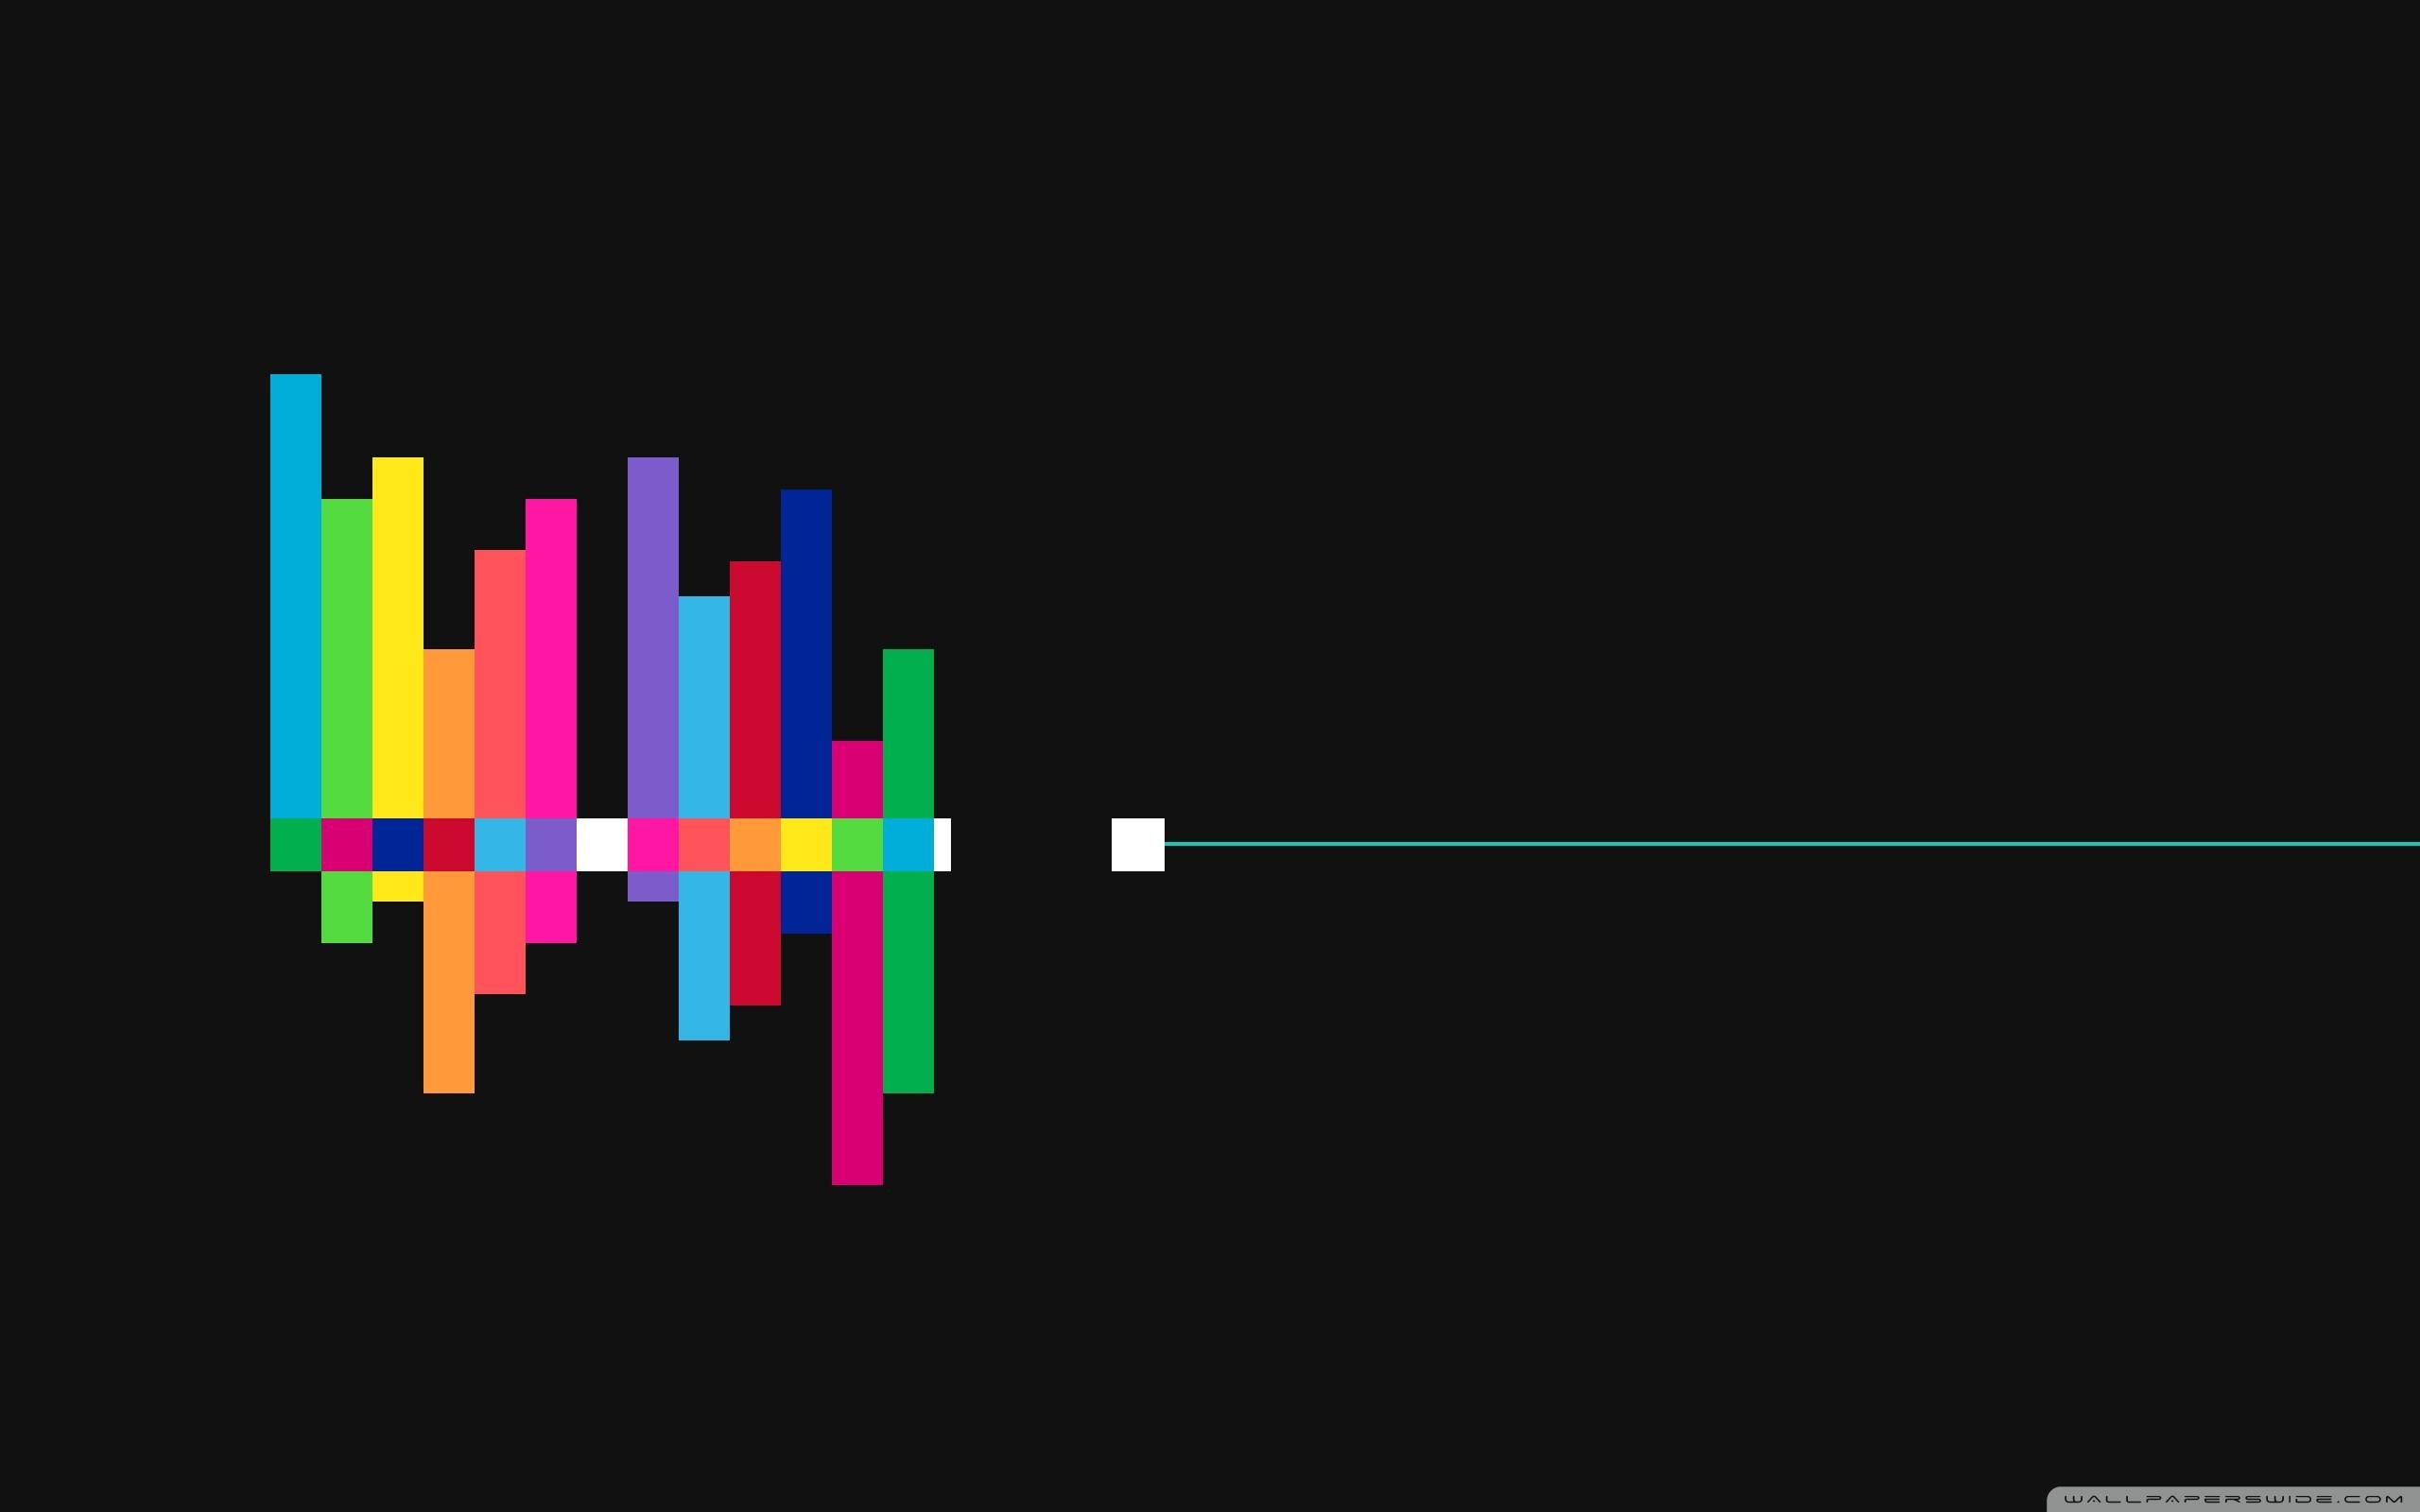 Most Inspiring Wallpaper Music Soundwave - 572517-beautiful-sound-waves-wallpaper-2560x1600  Pictures_597691.jpg